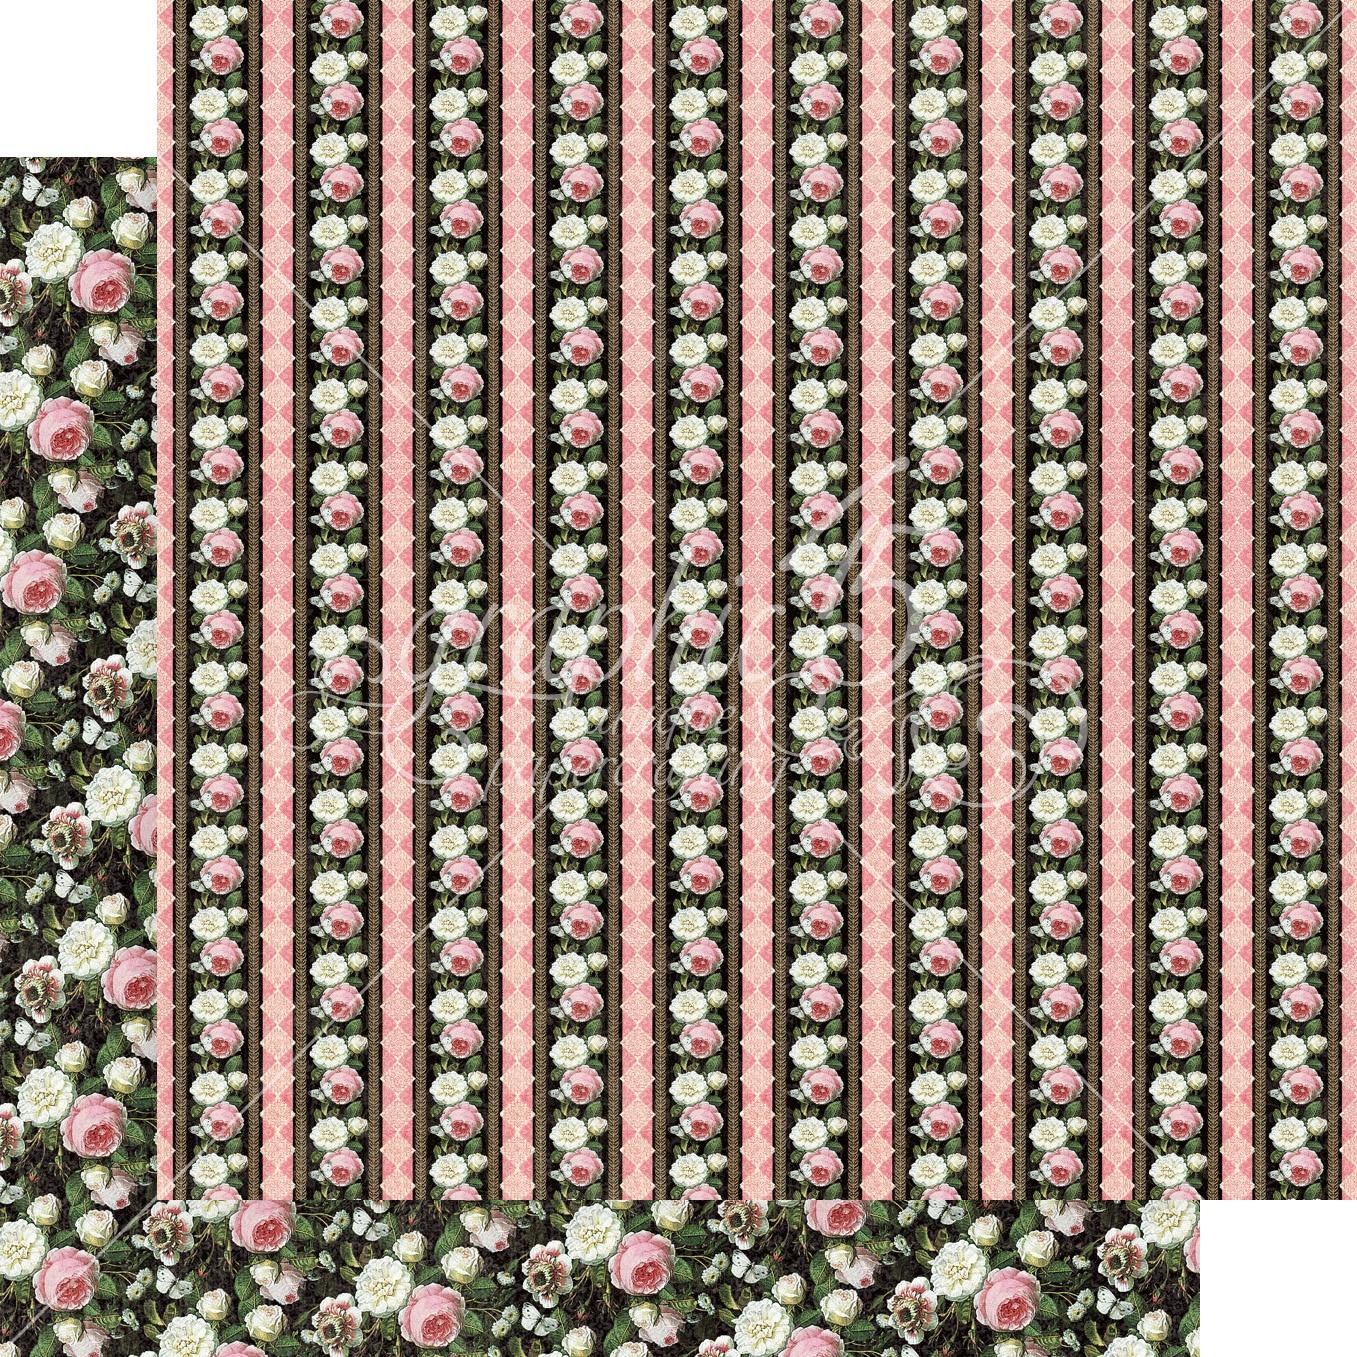 Elegance Double-Sided Cardstock - Lovely 12x12